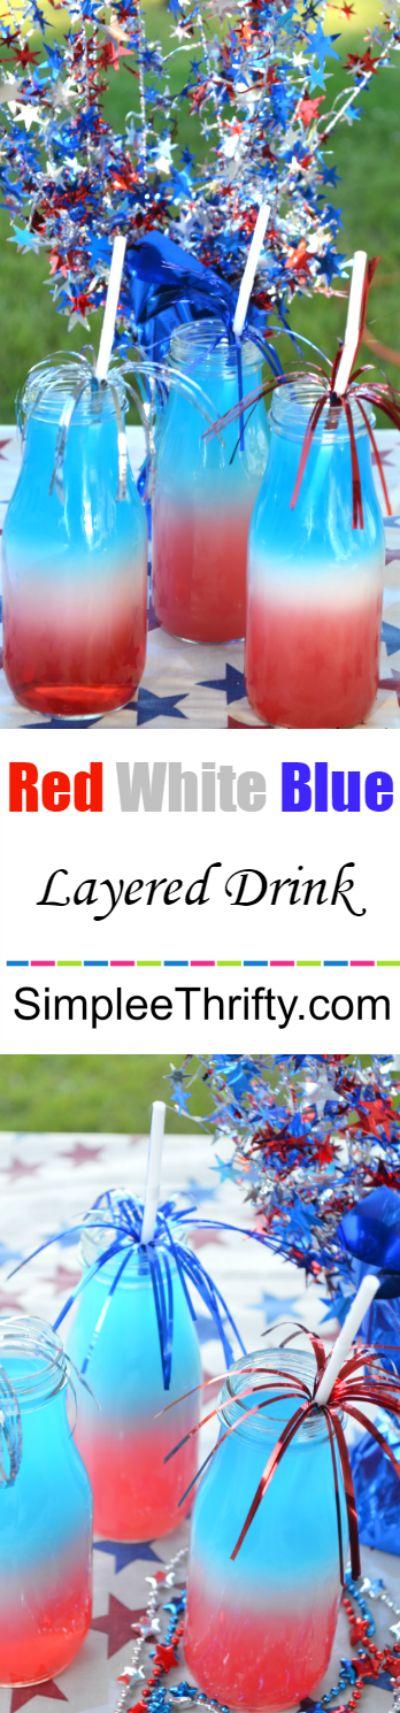 good memorial day drinks